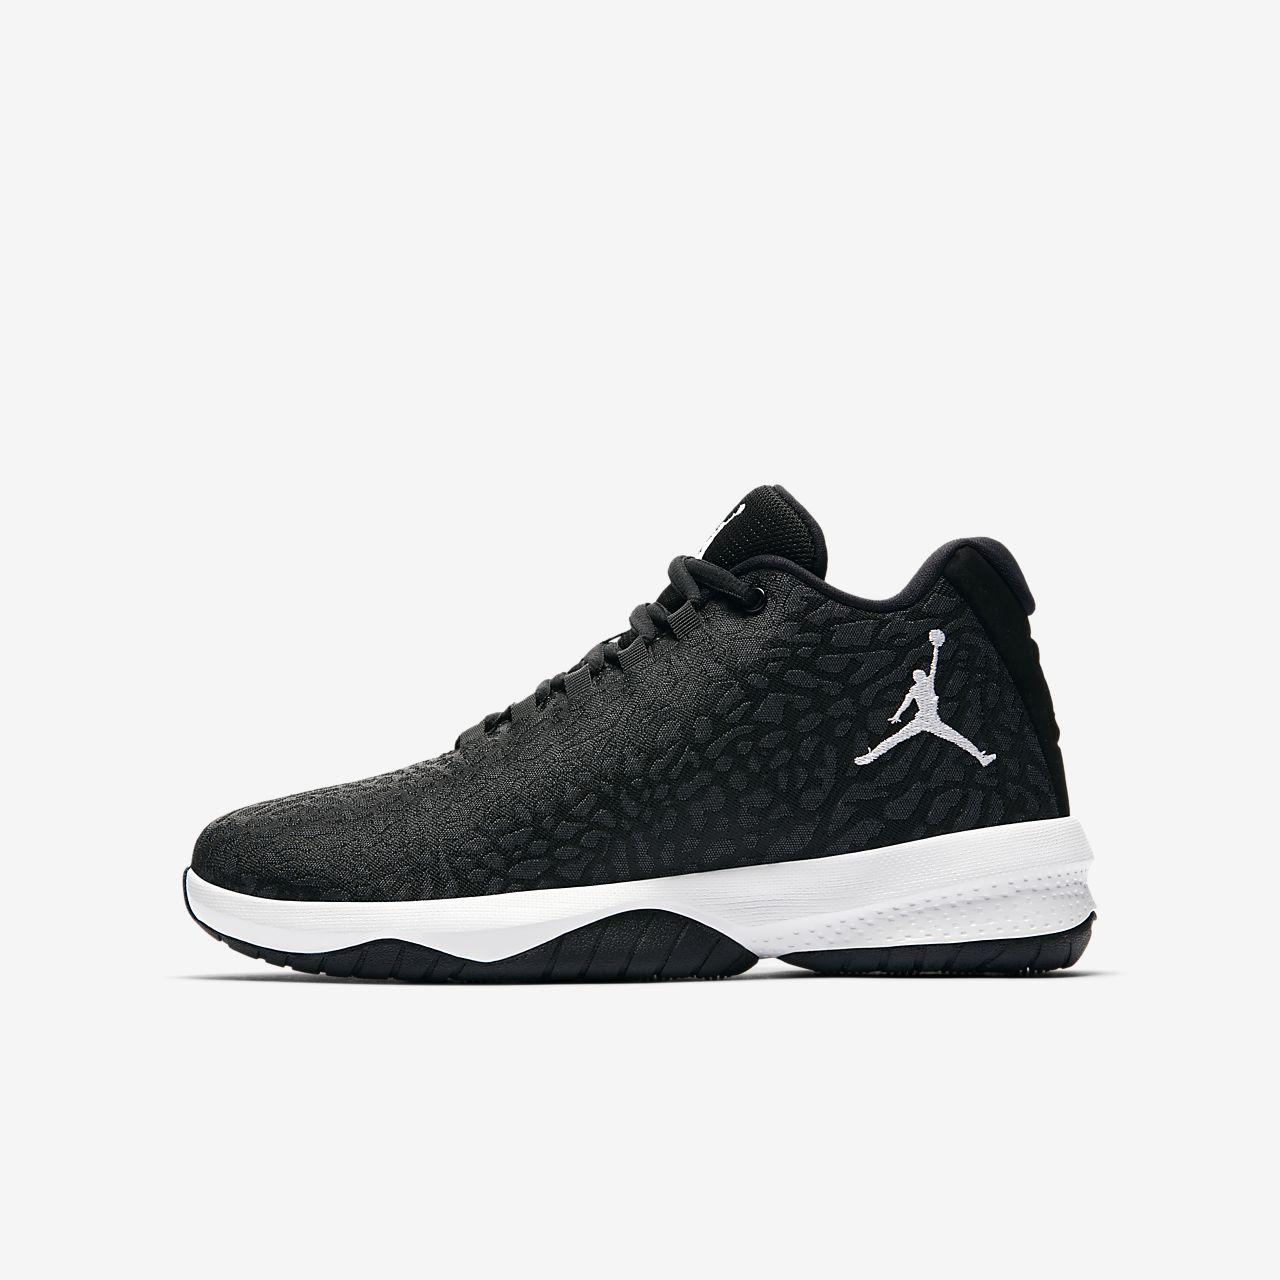 Billiga Nike Team Hustle D 8 Basketskor Ungdom | 51394 199